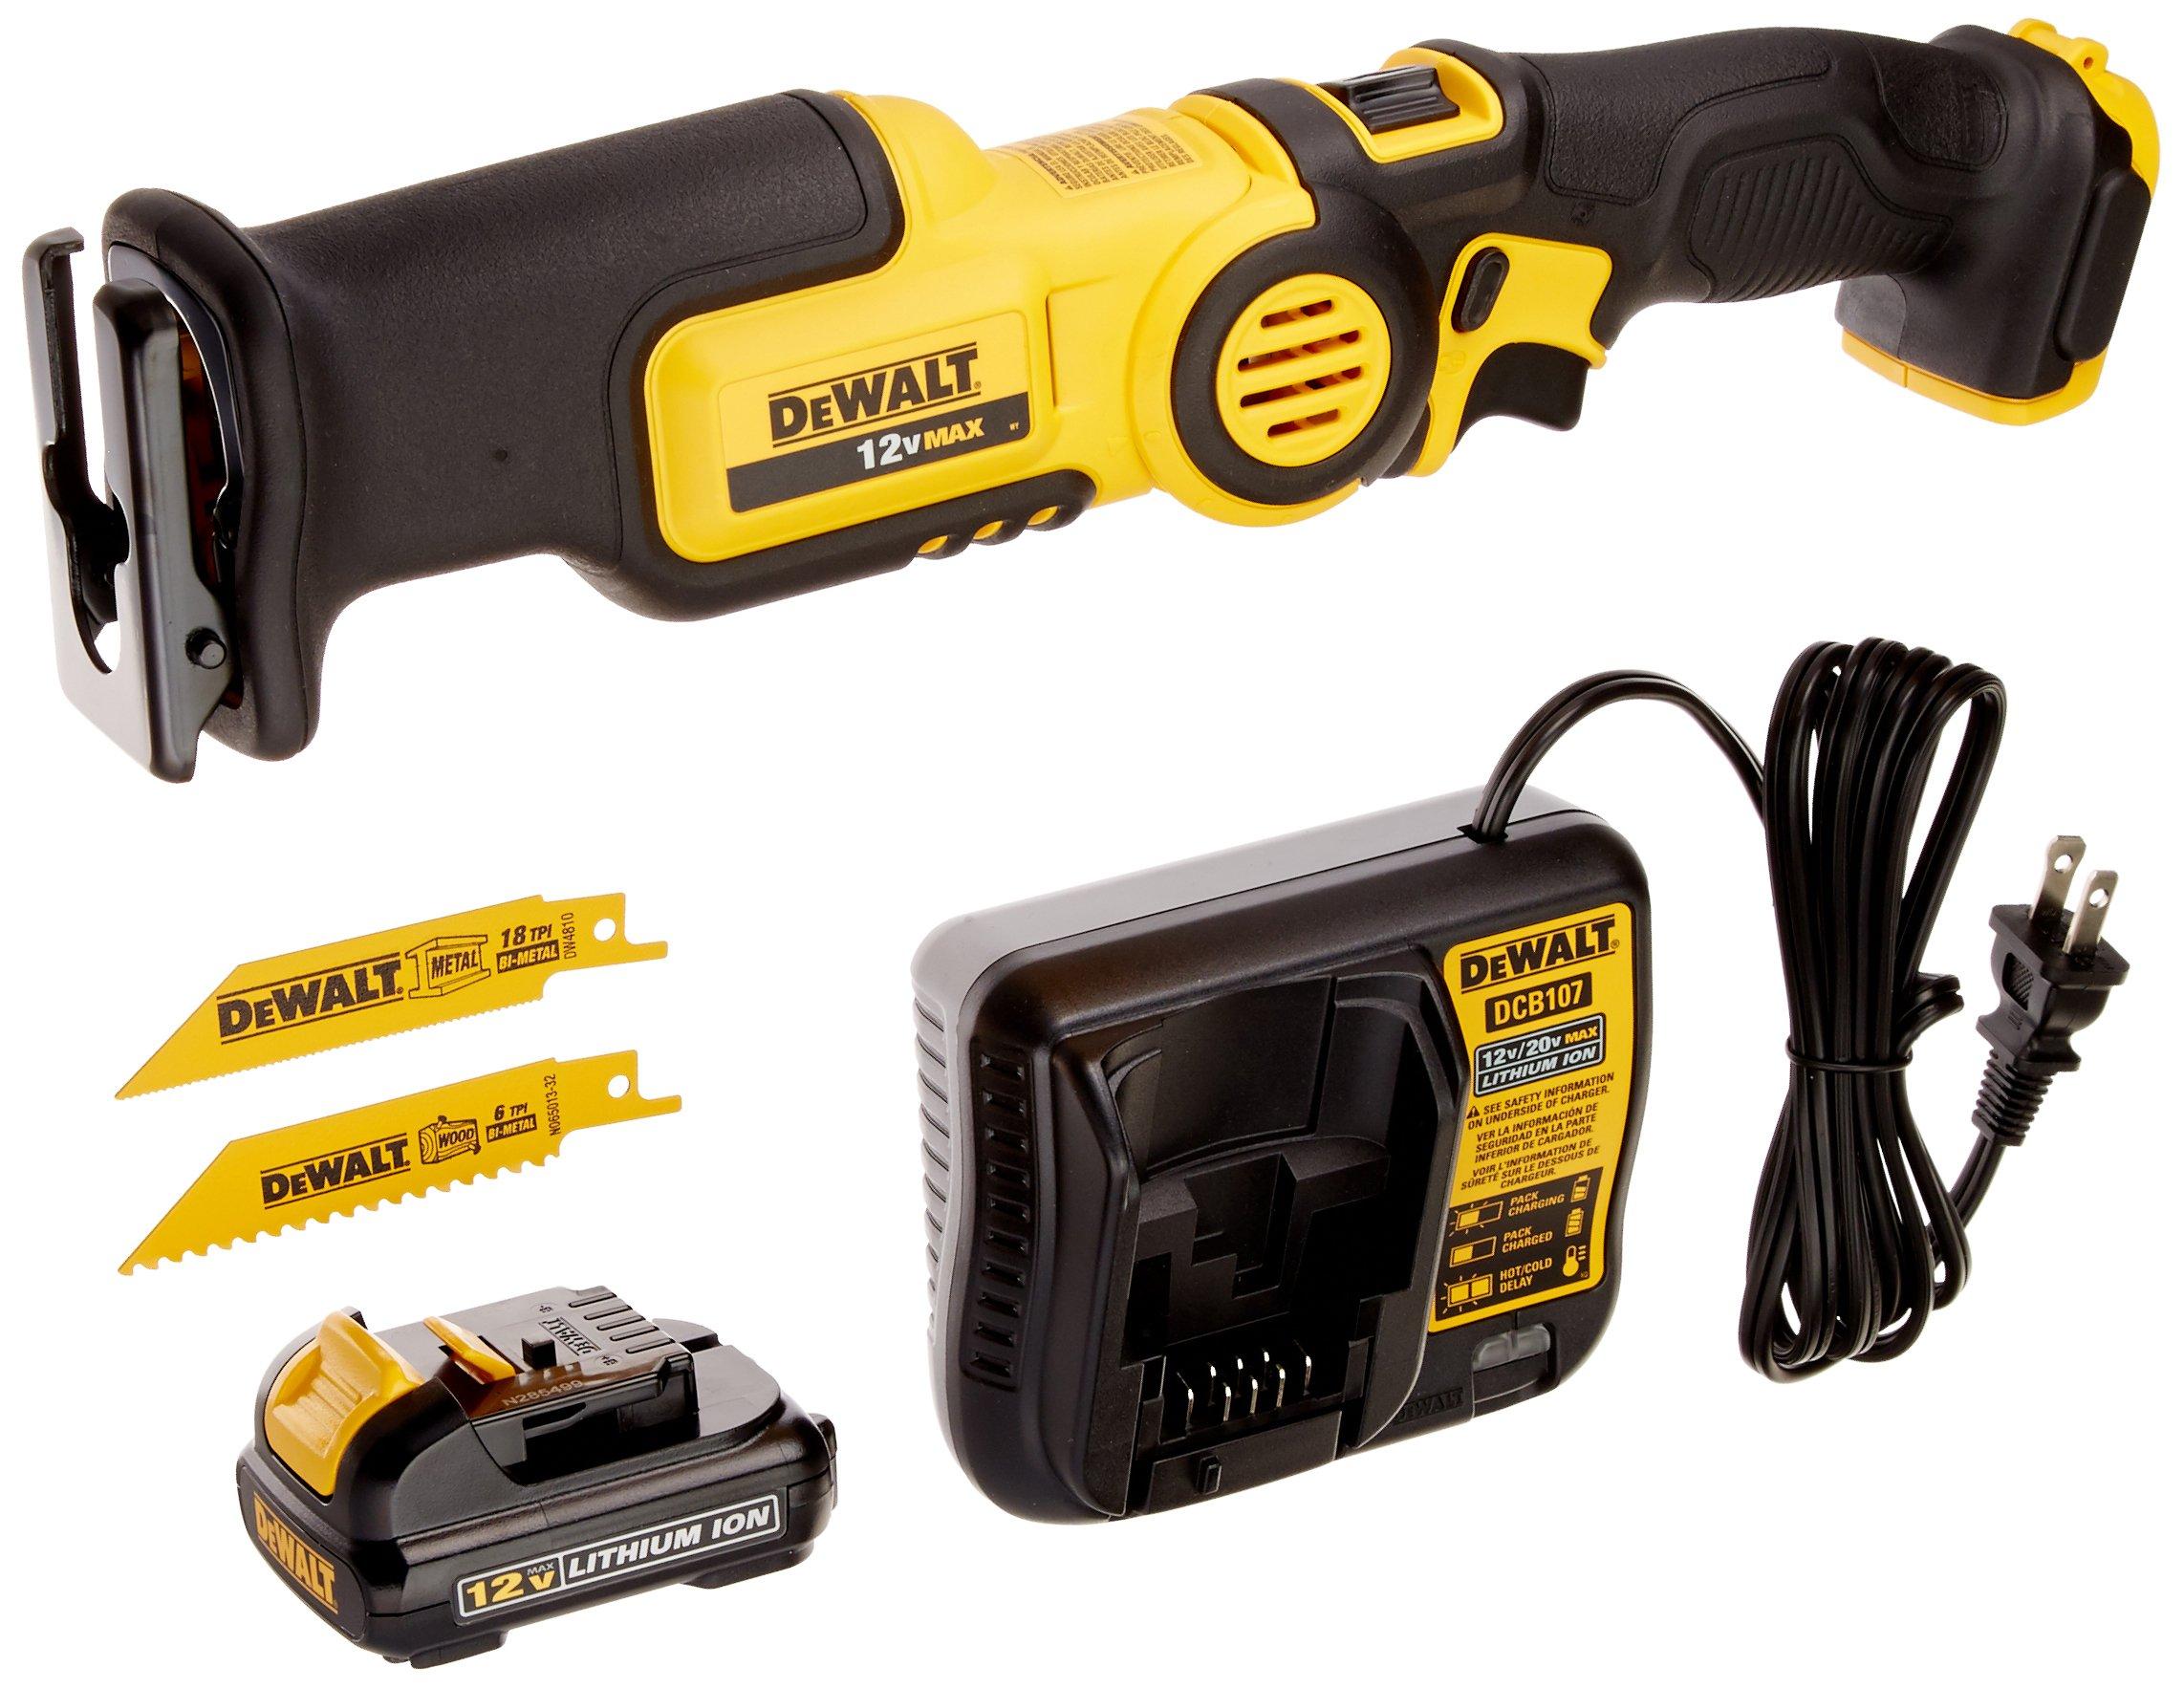 DEWALT 12V MAX Pivot Reciprocating Saw Kit (DCS310S1) by DEWALT